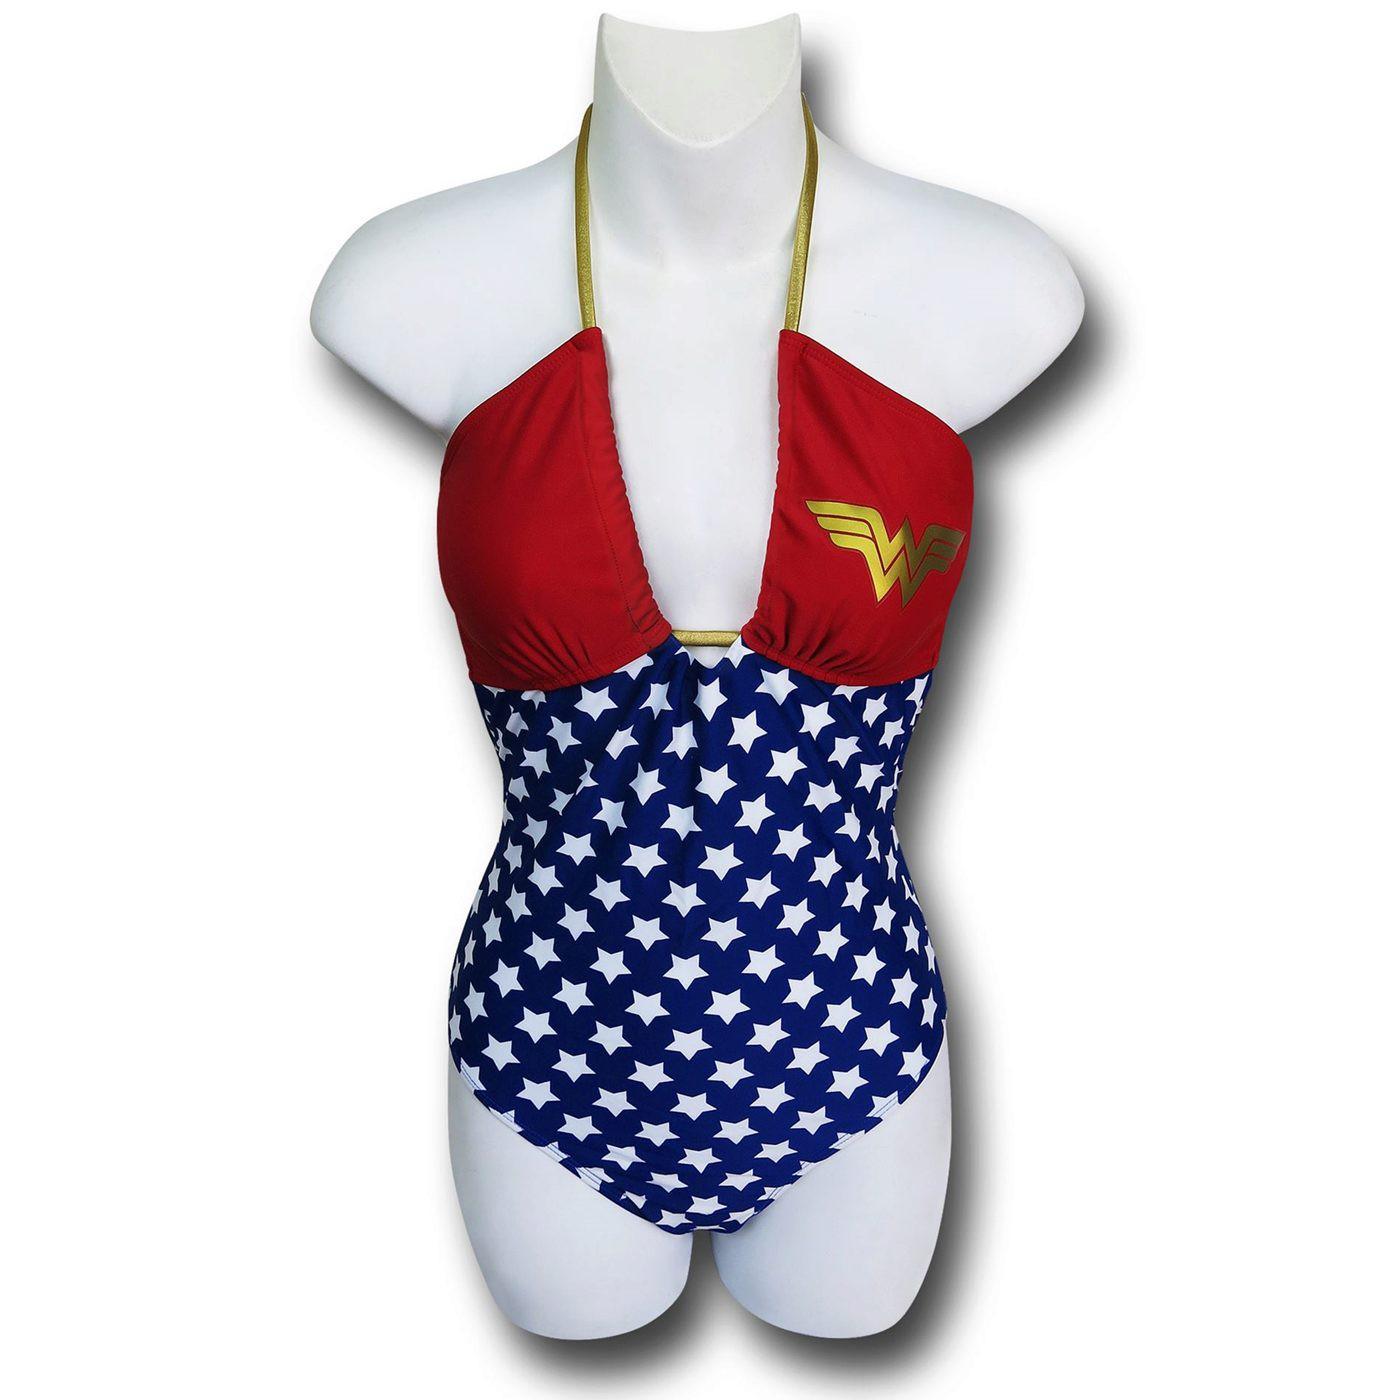 Wonder Woman Bandeau One-Piece Swimsuit